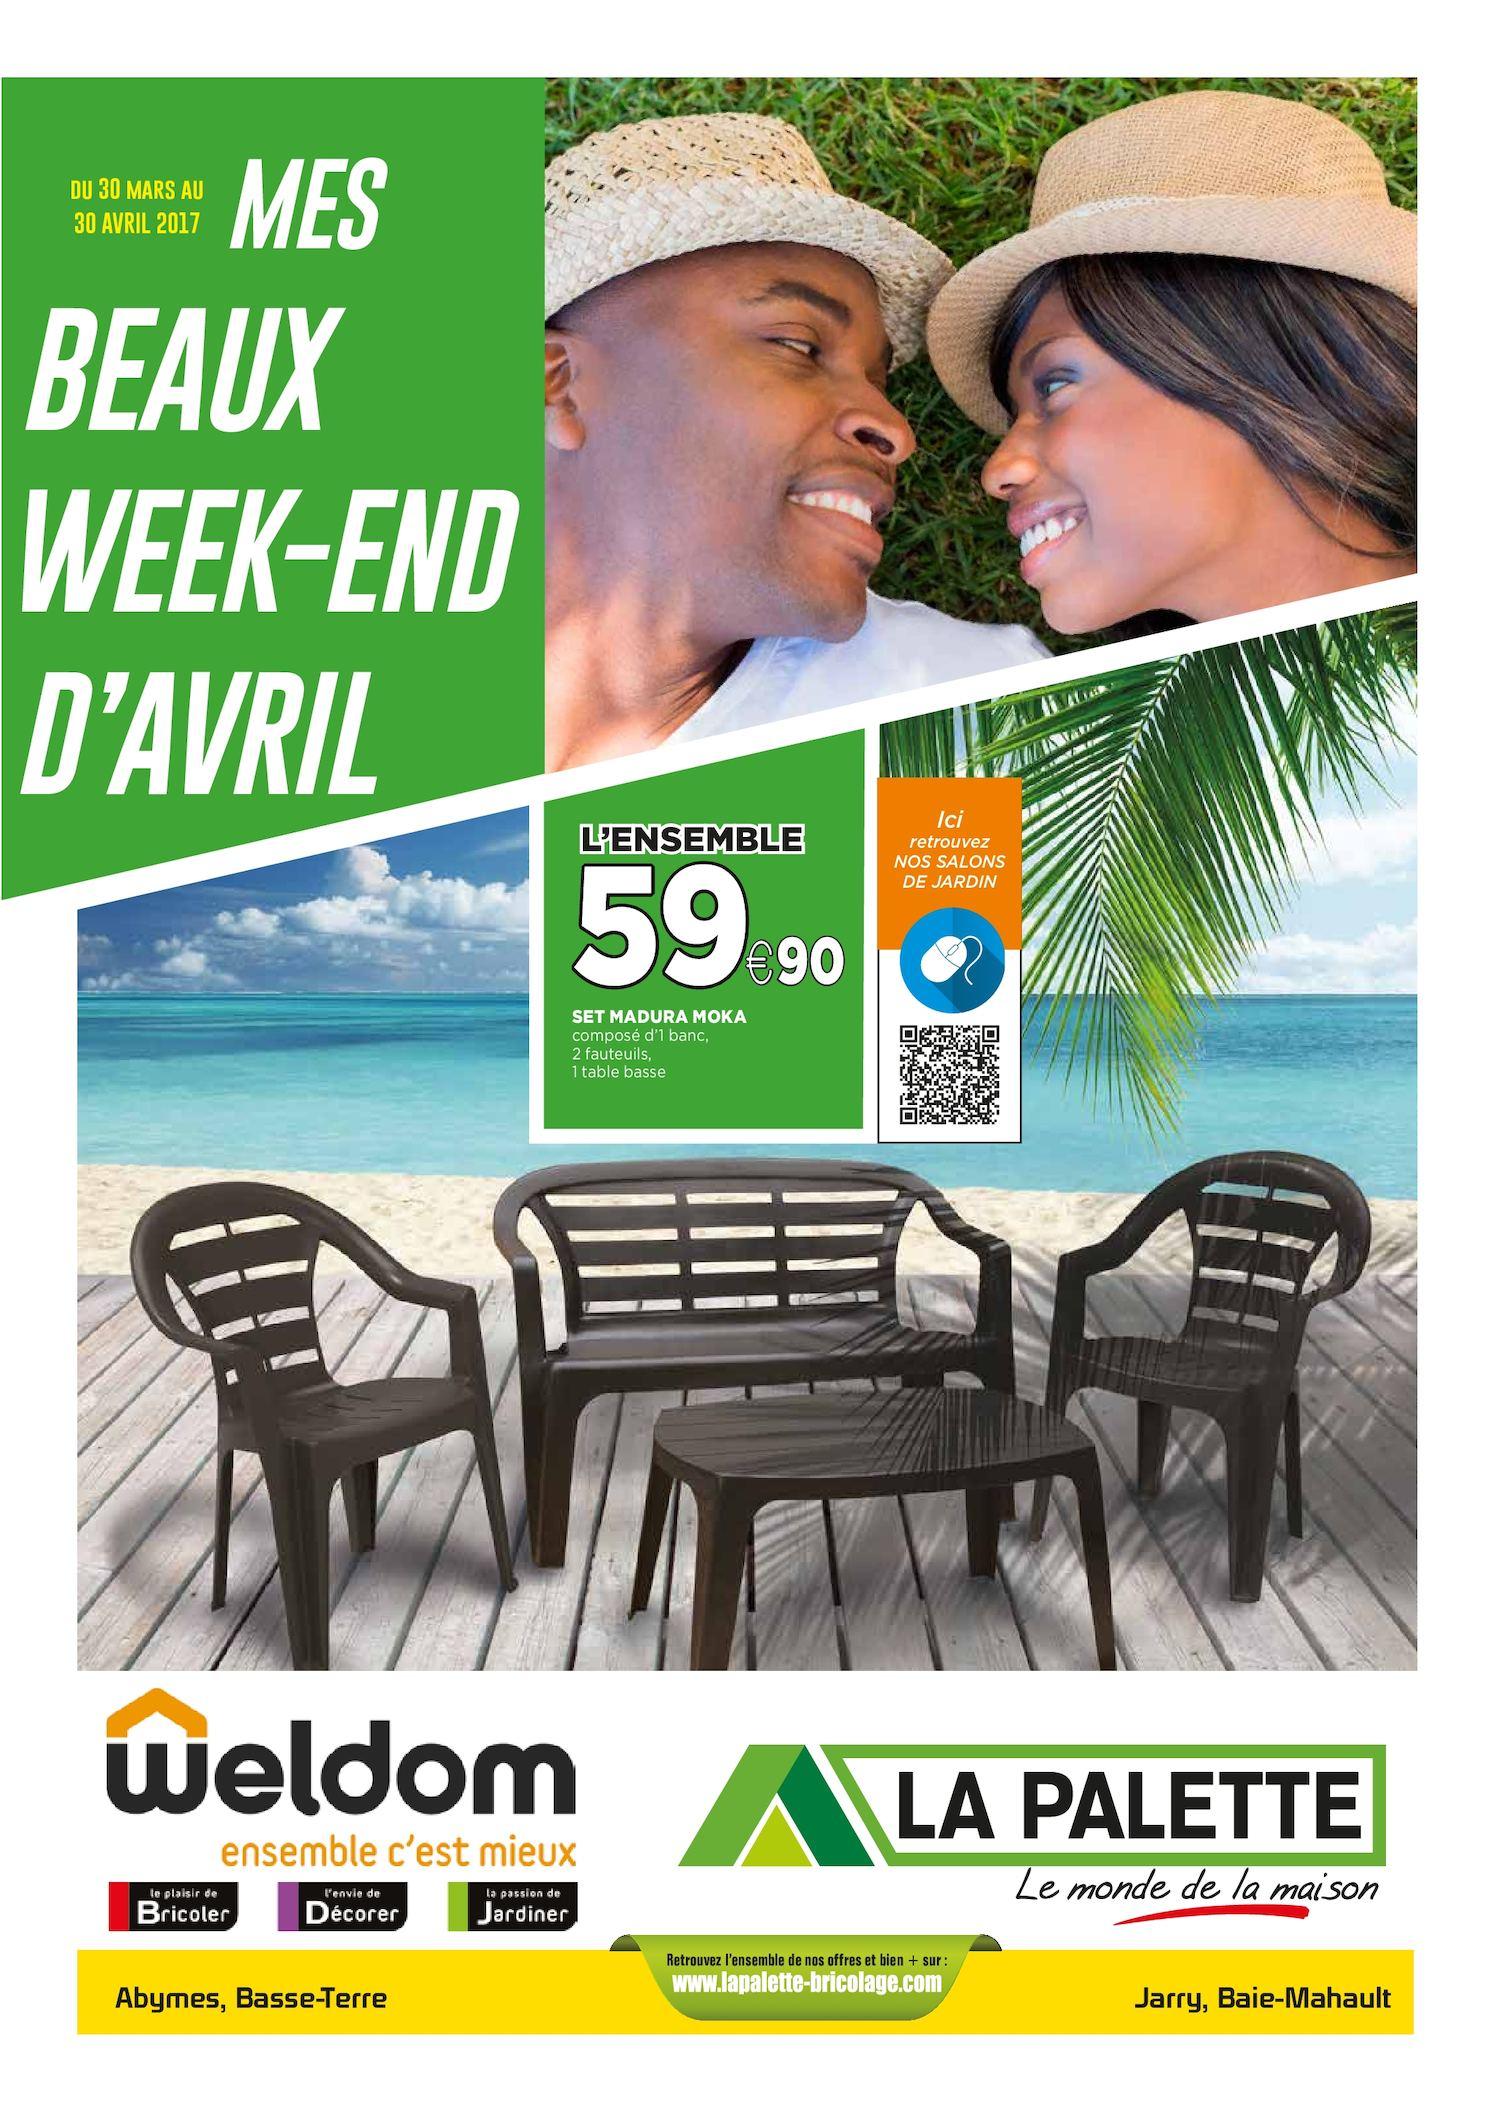 Calaméo - Mes Beaux Week-End D'avril - Guadeloupe avec Abri De Jardin Weldom